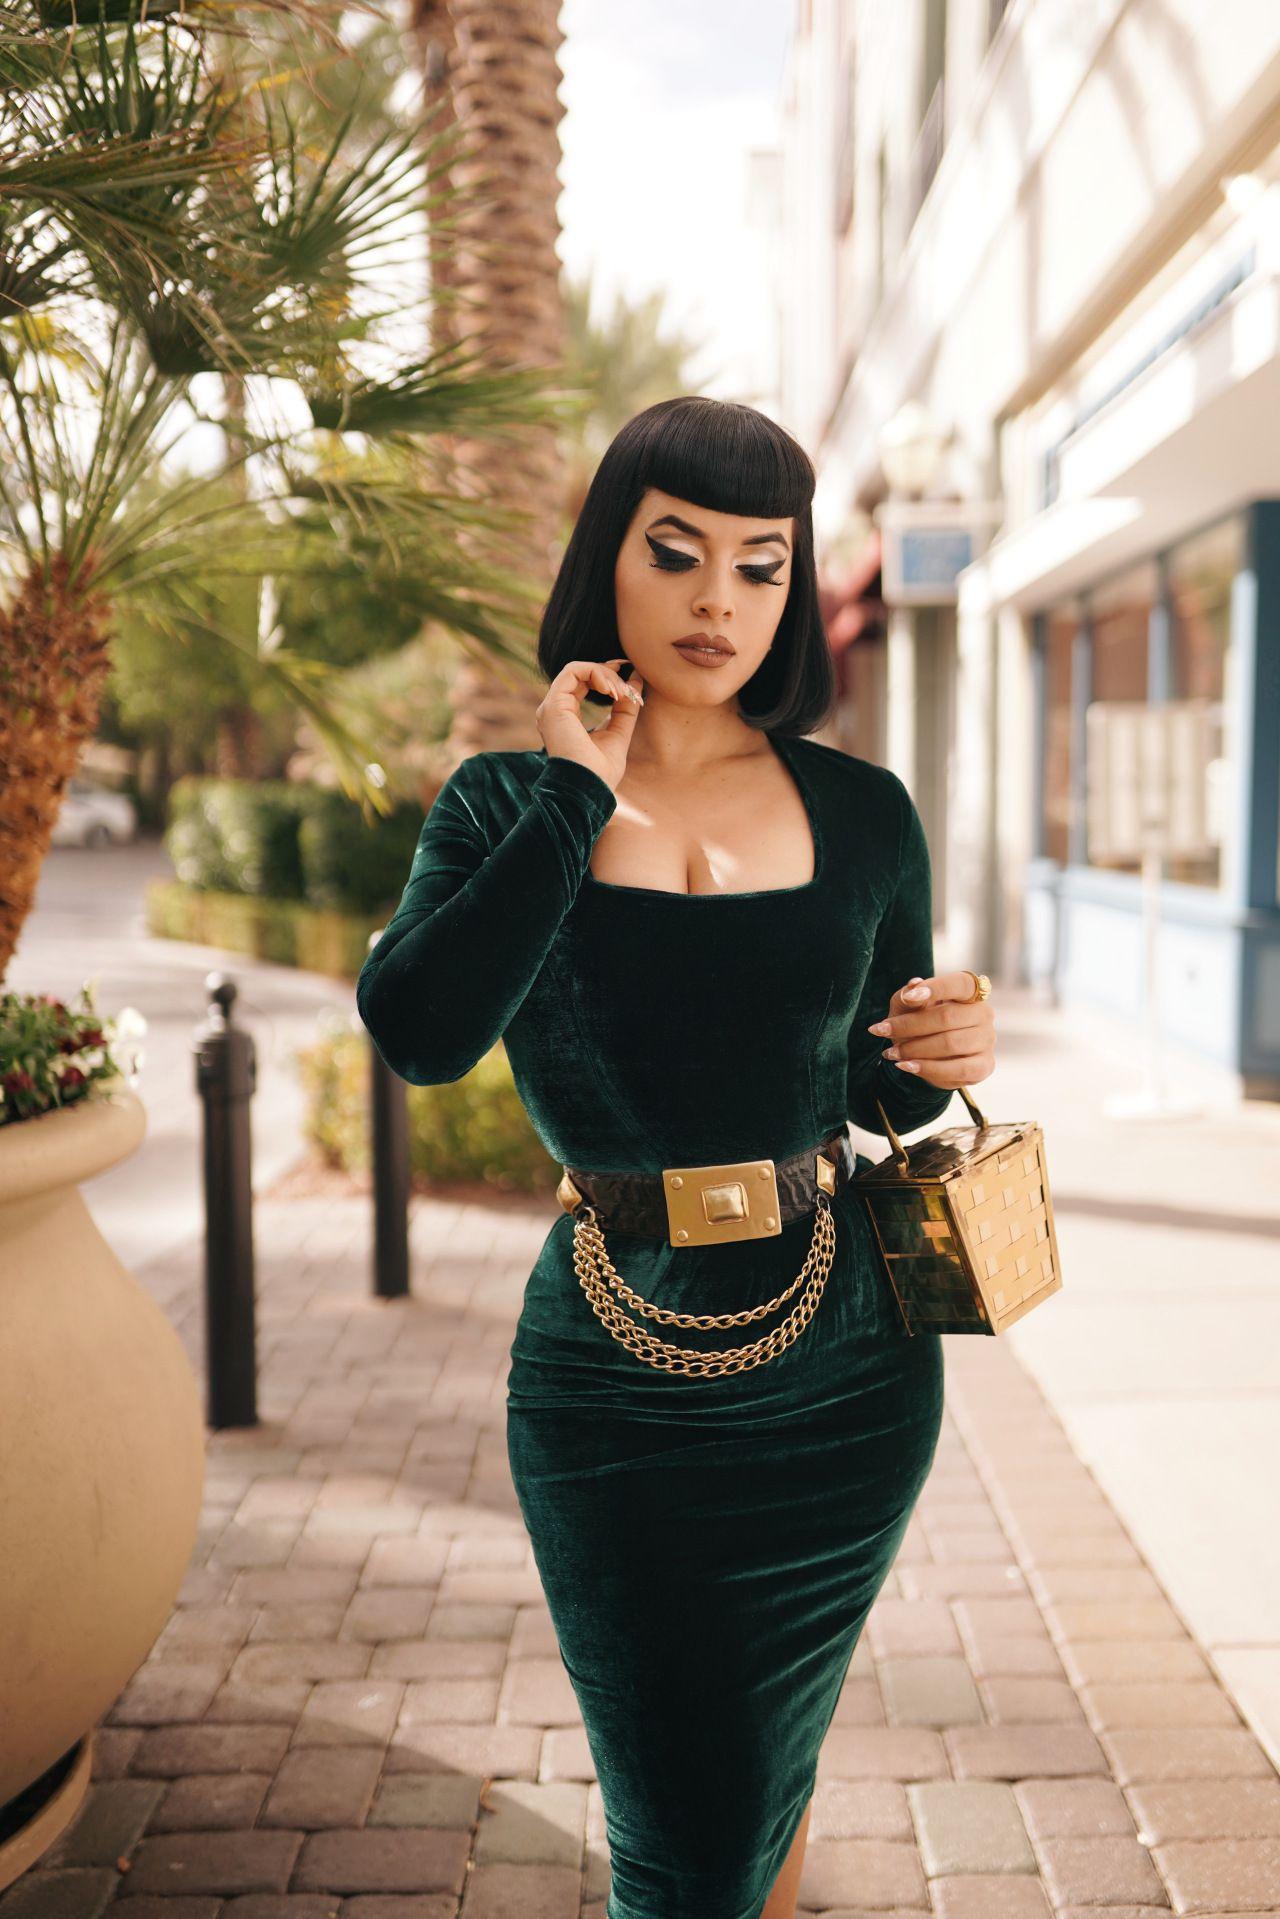 She Wore Emerald Velvet In 2021 Retro Fashion Vintage Green Velvet Dress Emerald Green Velvet Dress [ 1919 x 1280 Pixel ]